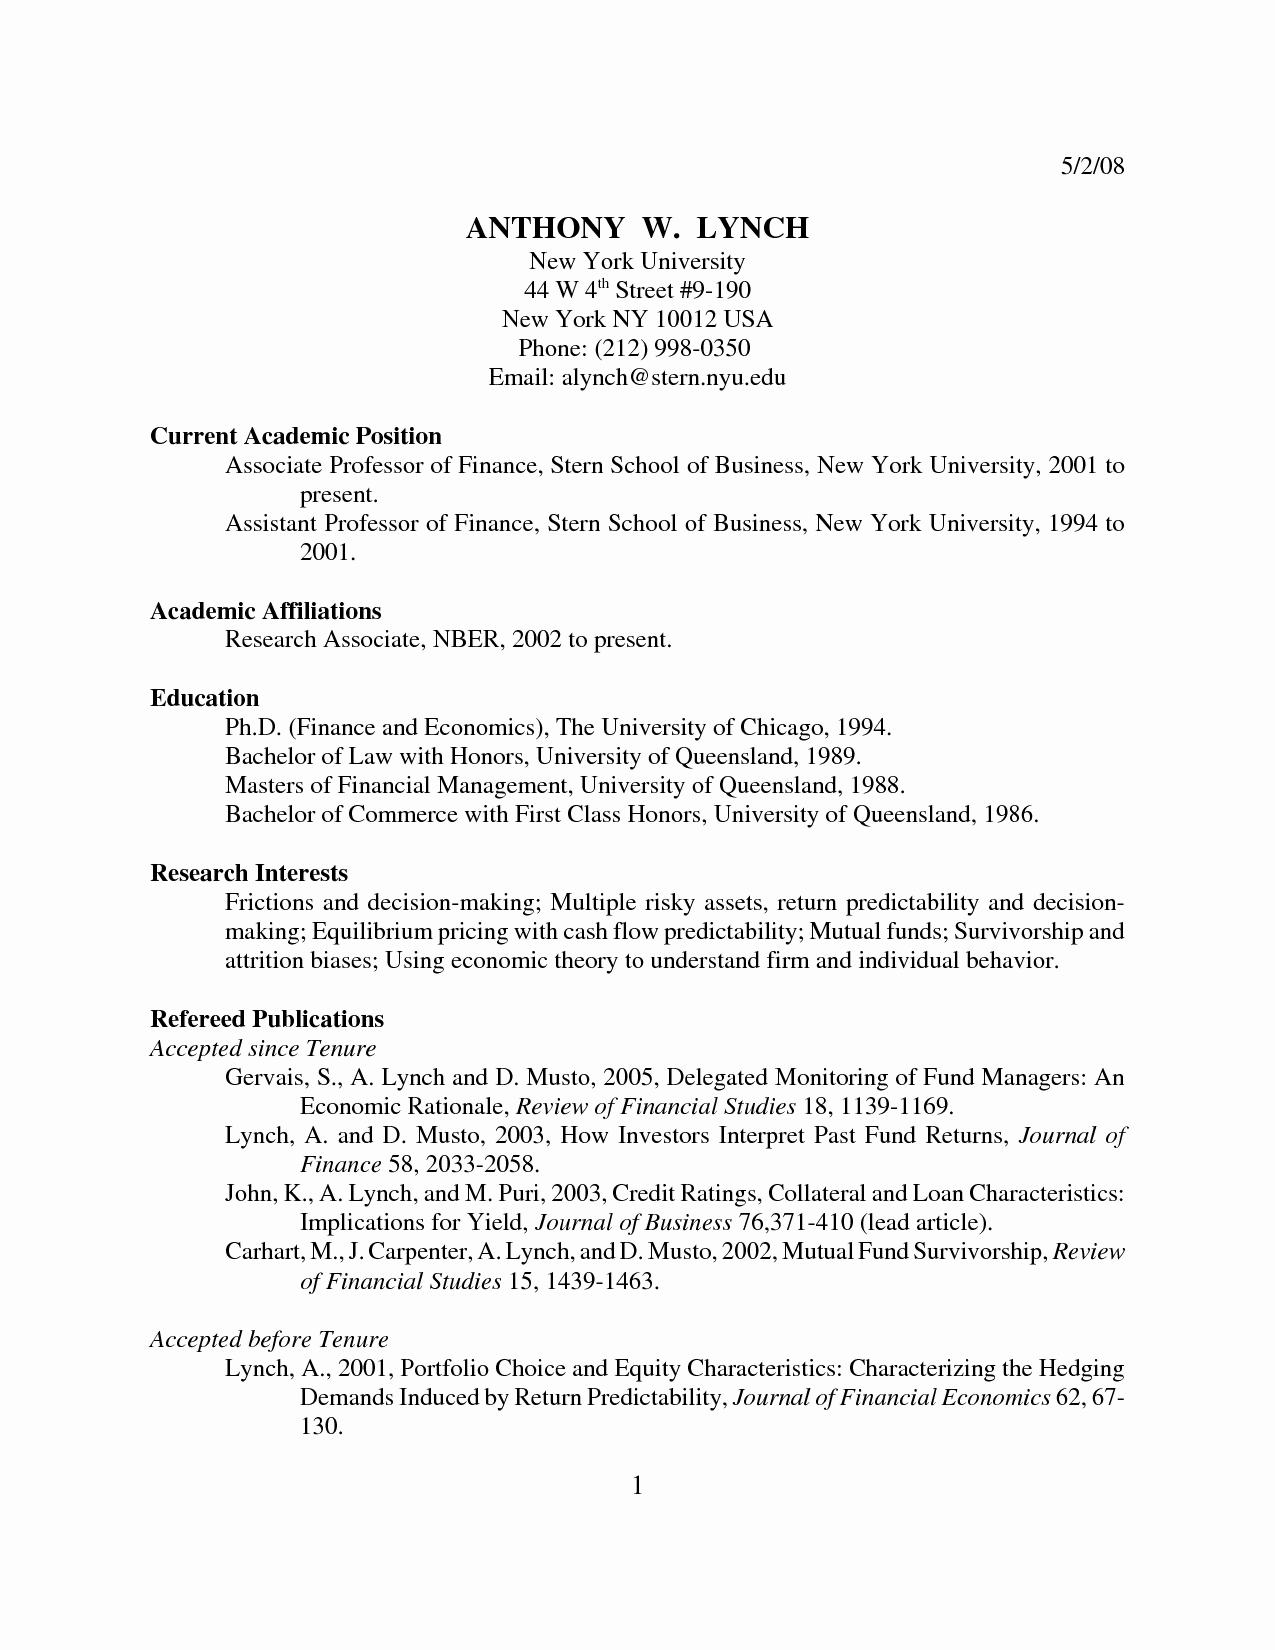 Research Paper Proposal Template Fresh Apa Undergraduate Research Paper Bamboodownunder